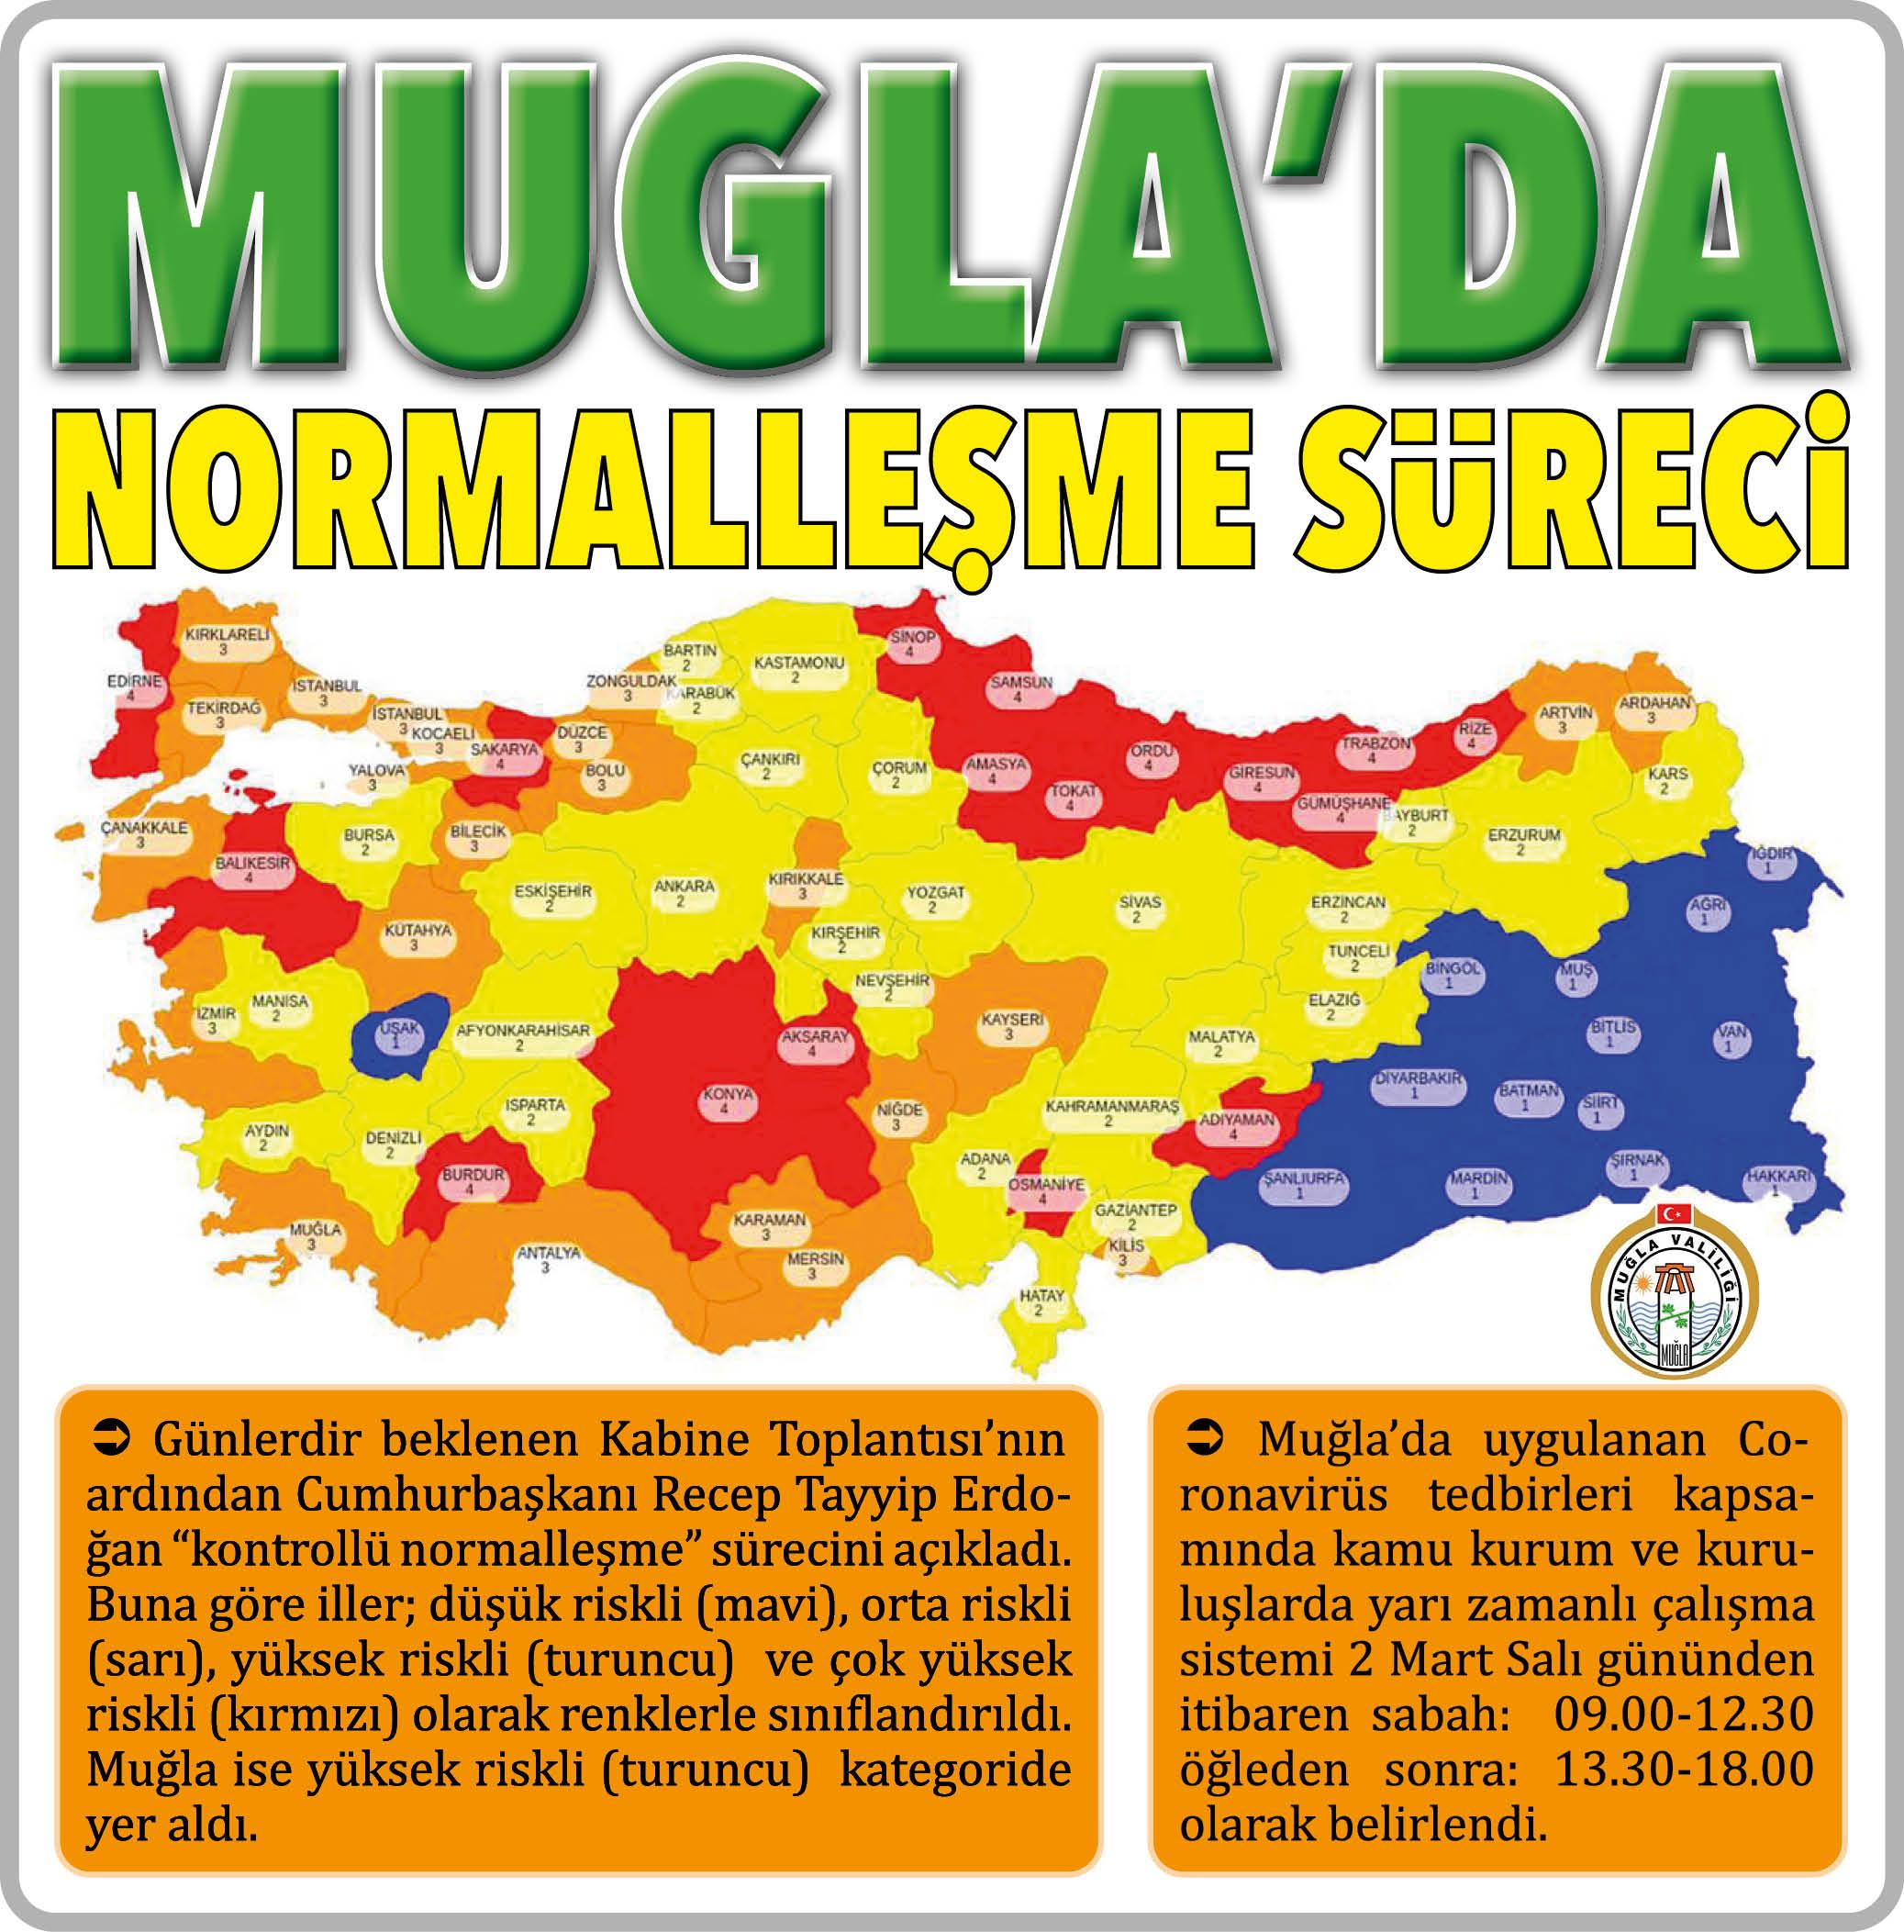 MUĞLA'DA NORMALLEŞME SÜRECİ